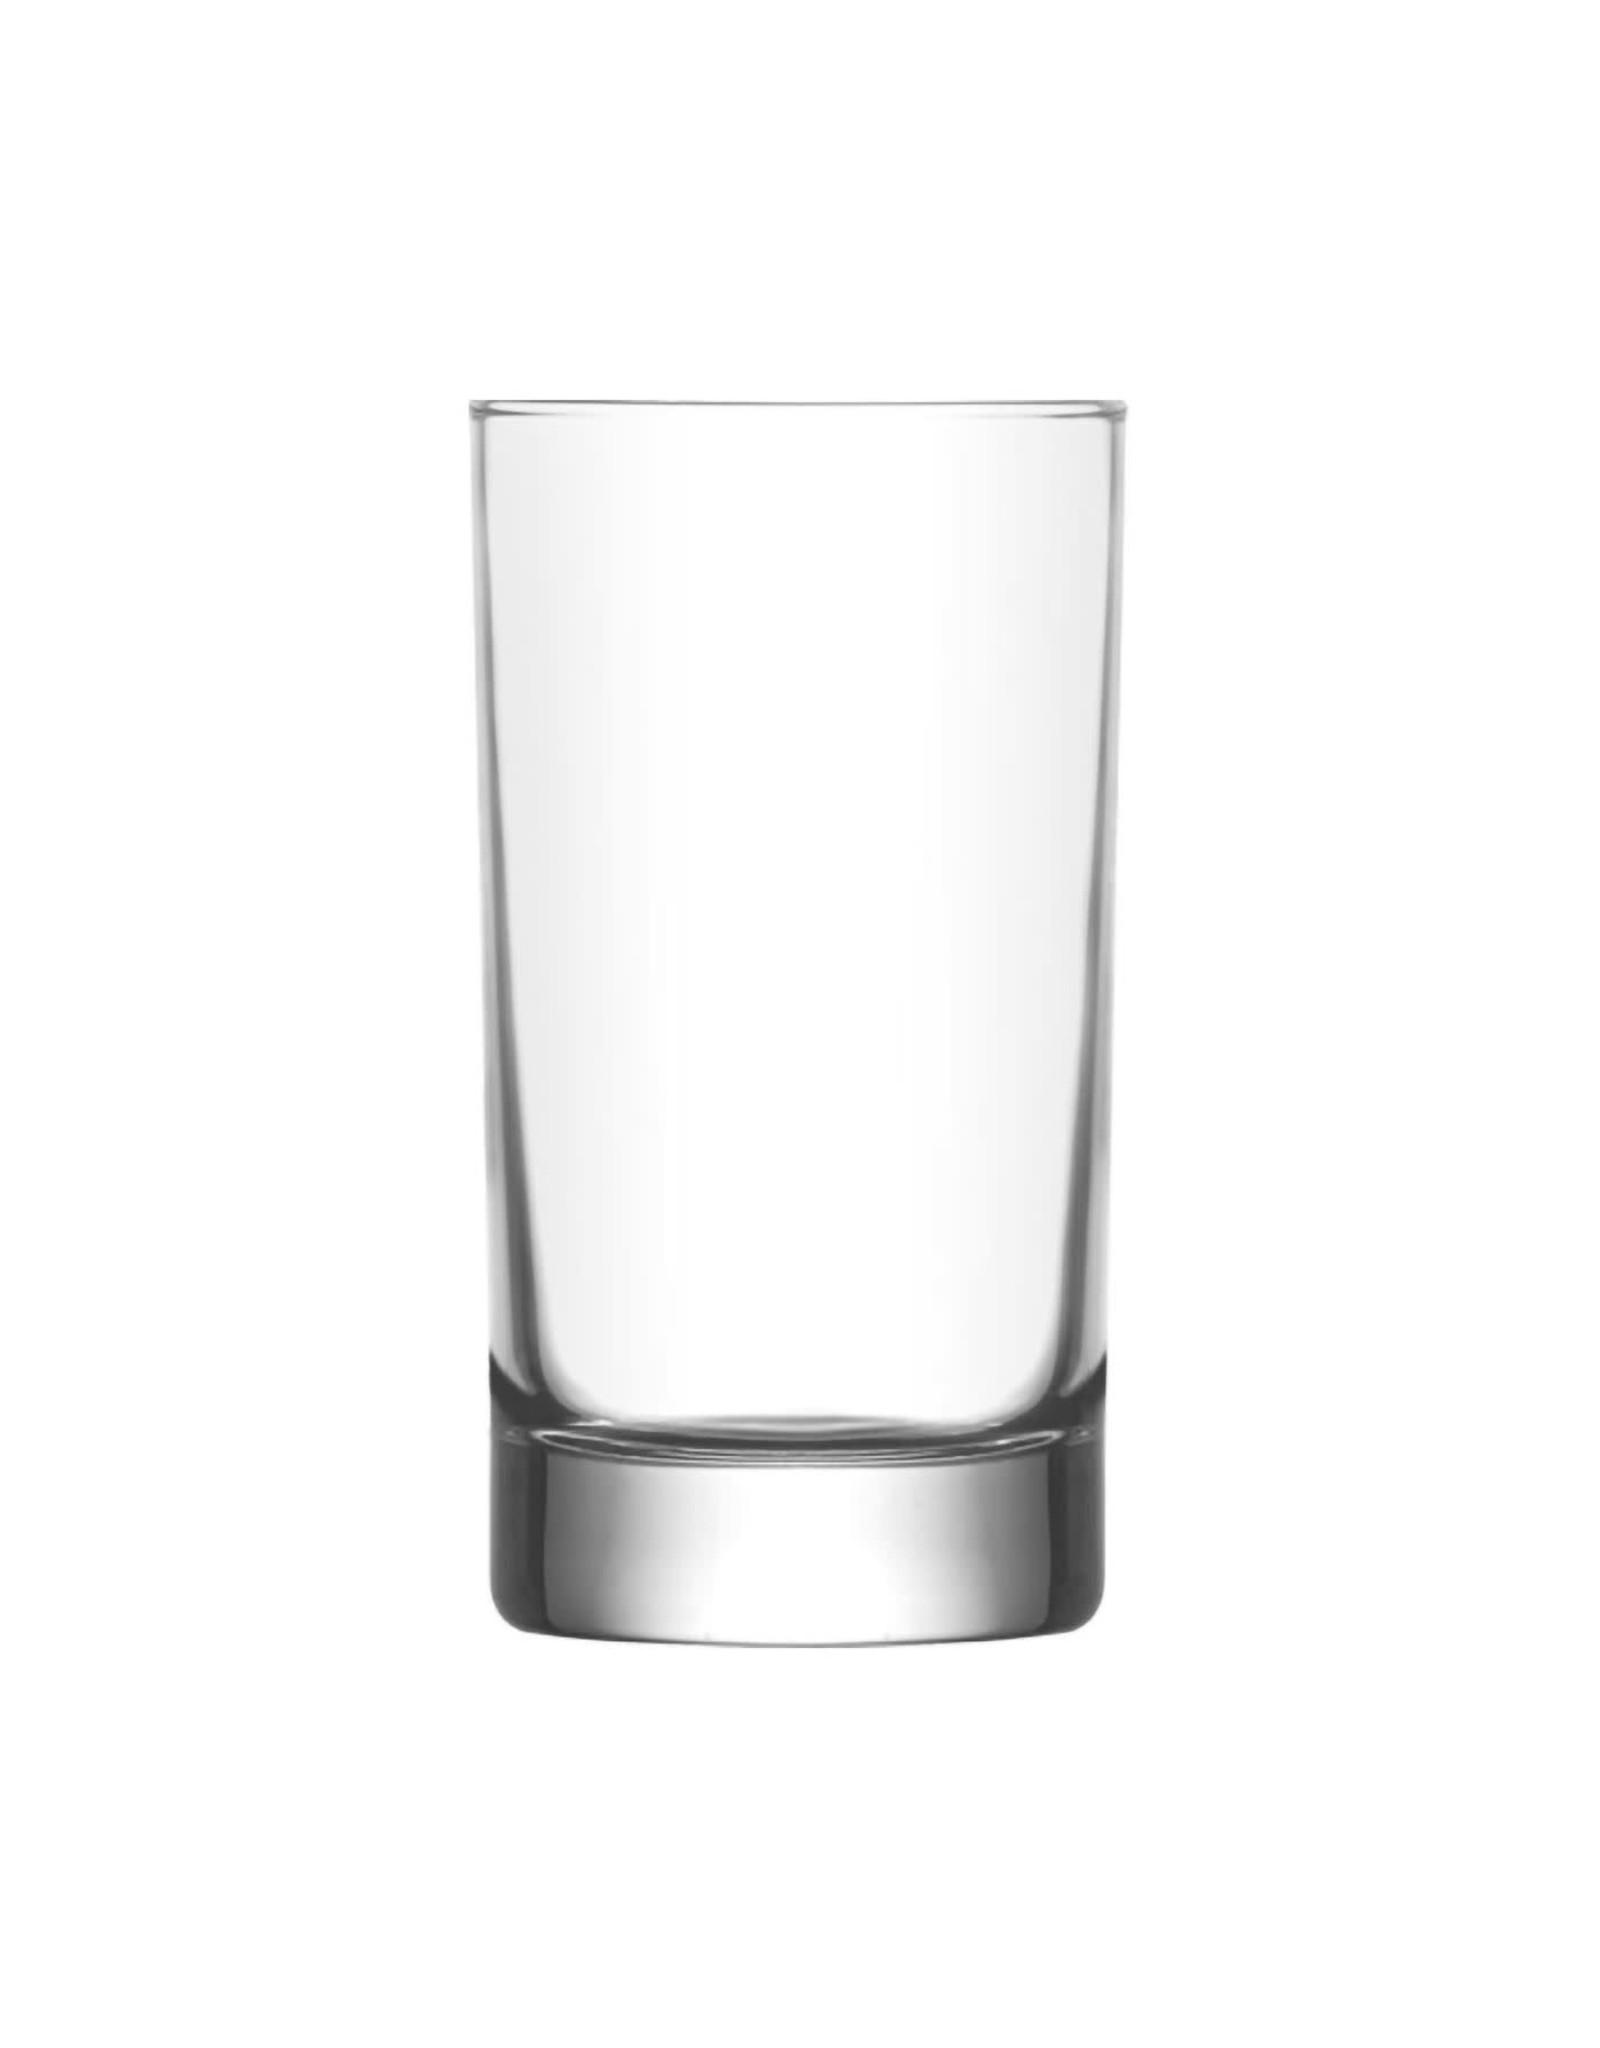 ADA 5 OZ Juice Glass,Pack of 6